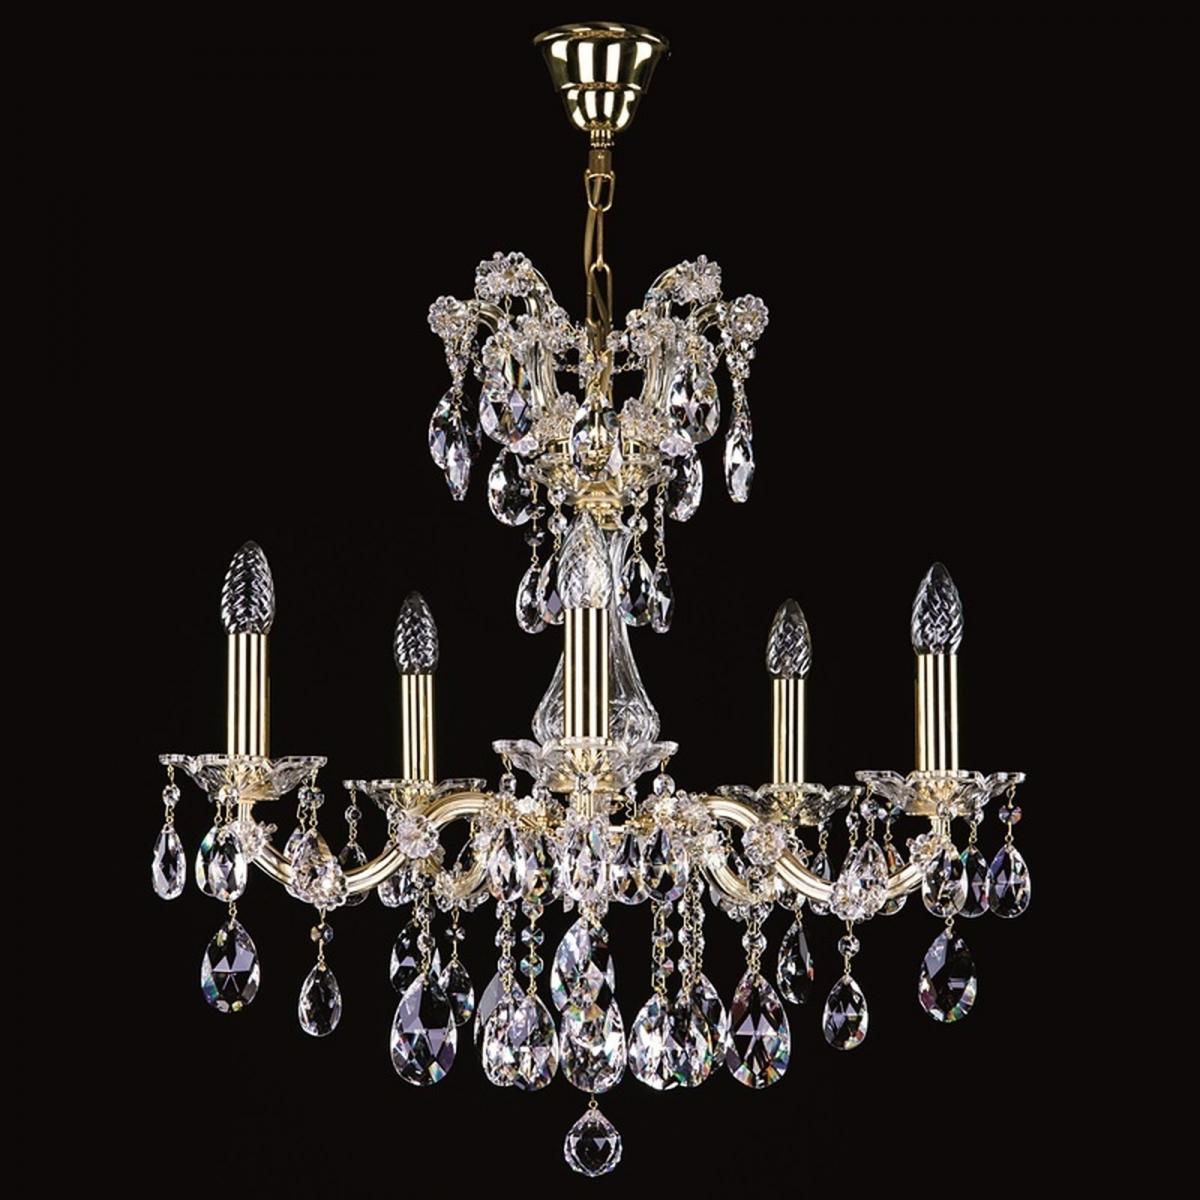 Crystal chandelier MARIA TEREZIA 34